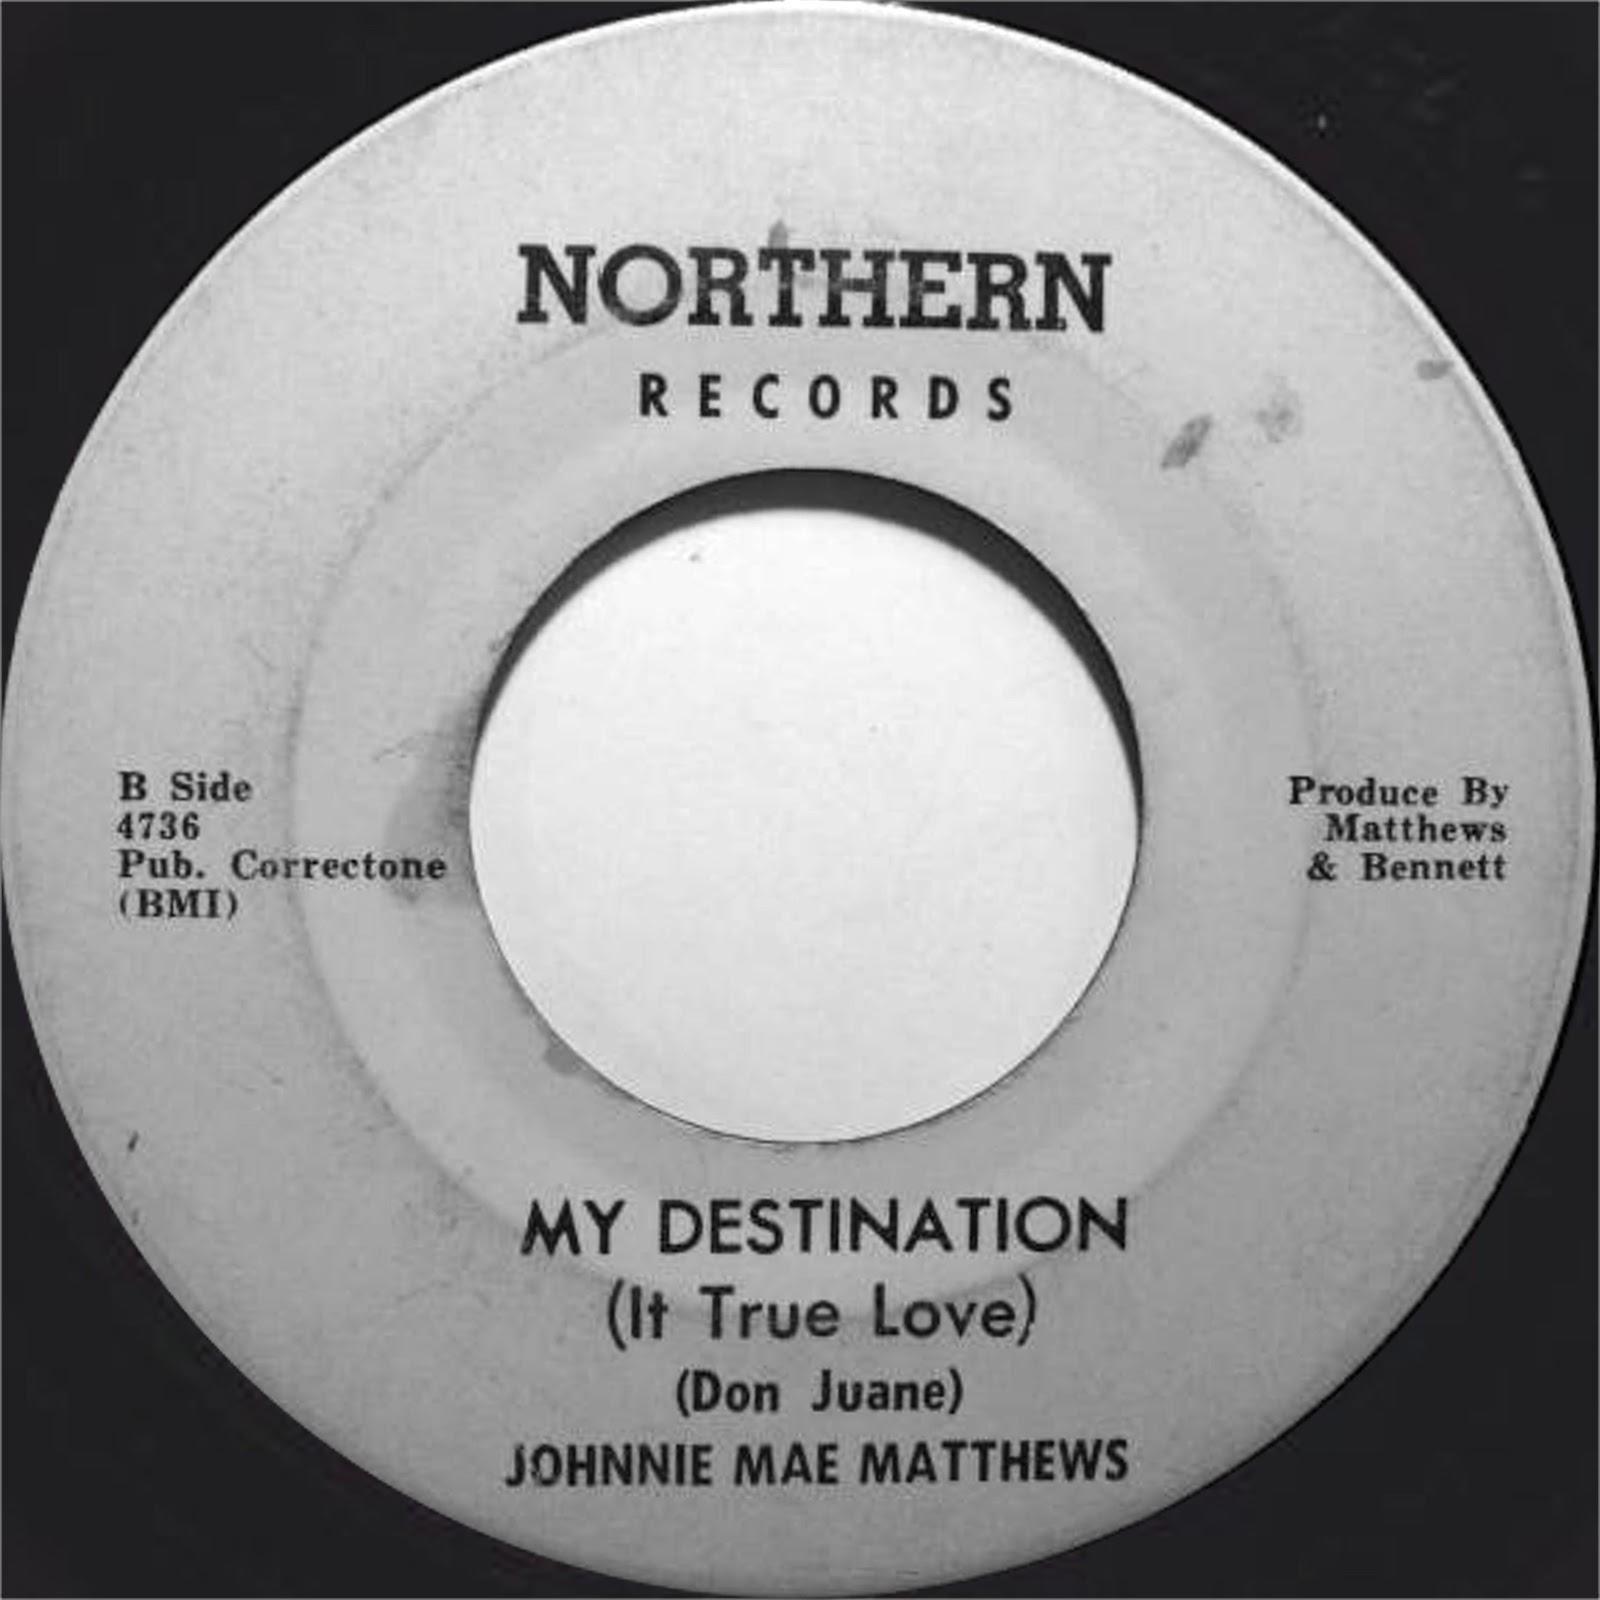 black singles in matthews Backwash, black moth super rainbow, rad cult, 7 vinyl, rsd limited run   live at abbey road, def leppard, island, 12 vinyl single, 'rsd first', 4000.